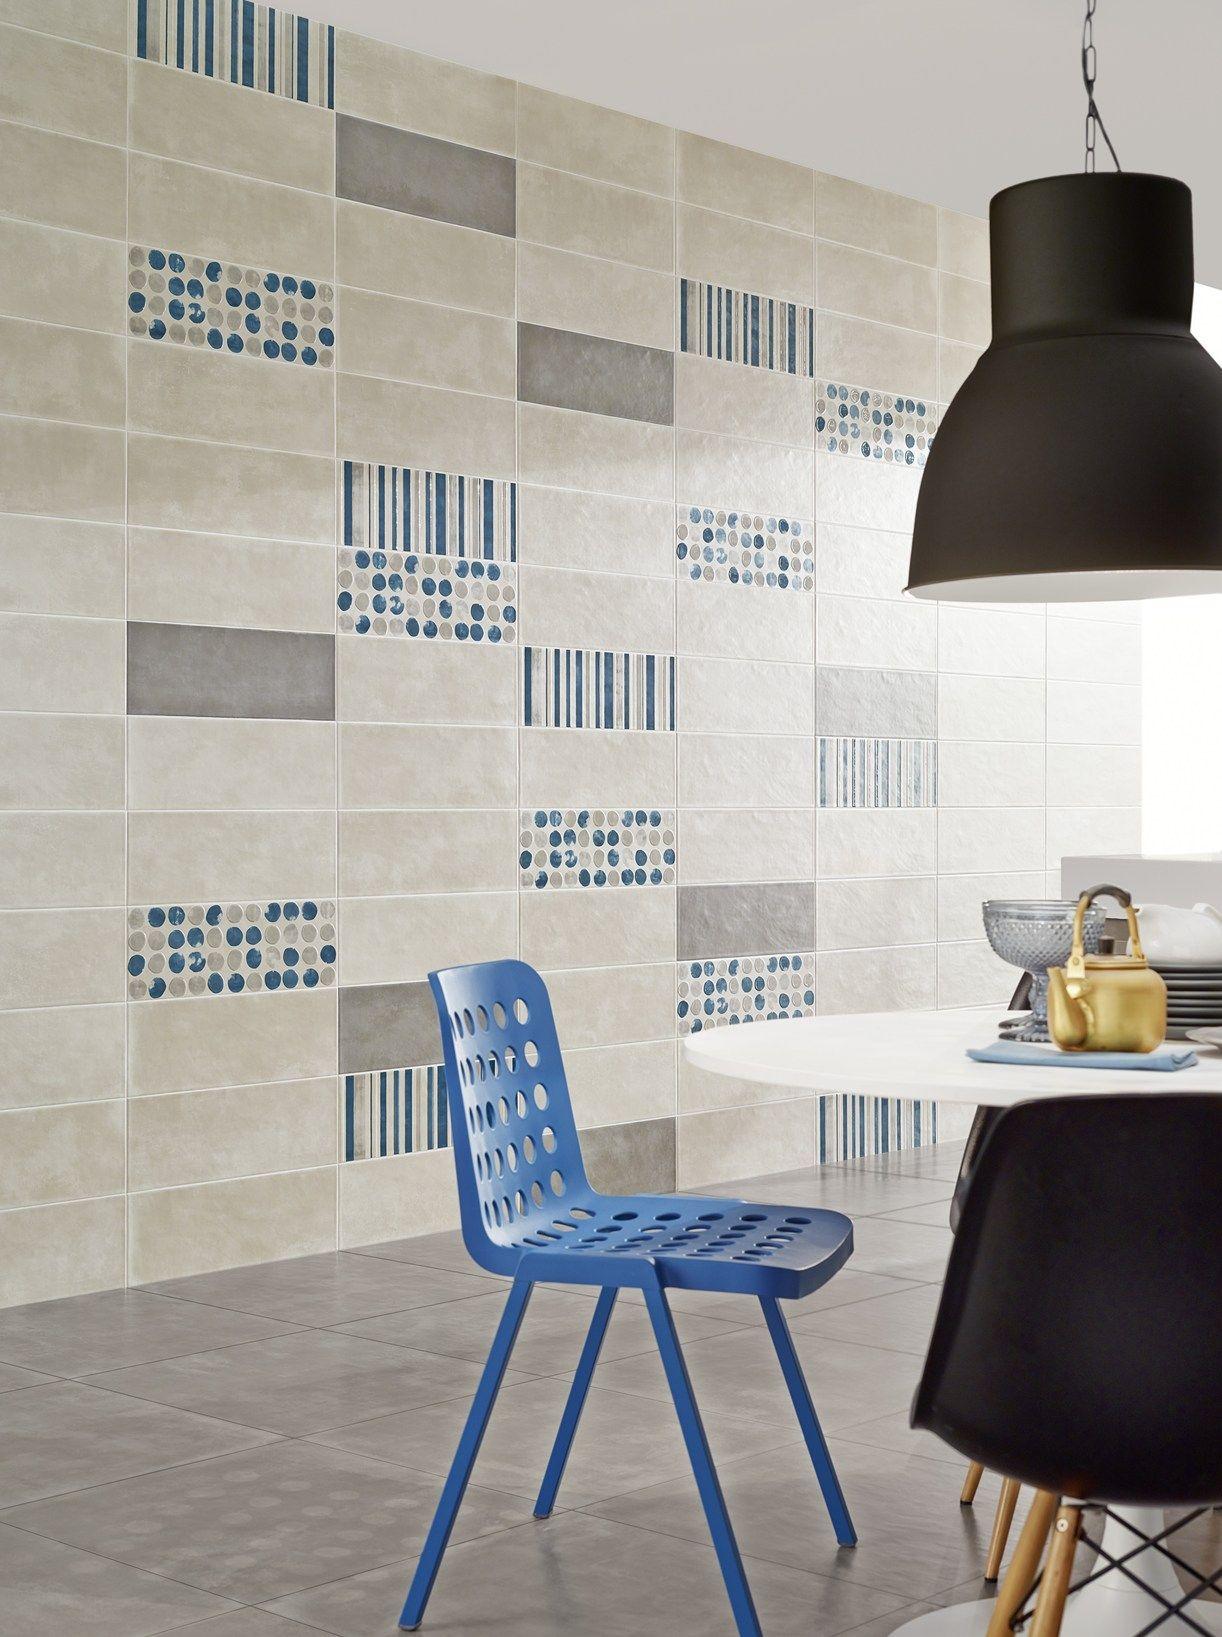 Ceramic tiles presents ground at cersaie love ceramic tiles presents ground at cersaie dailygadgetfo Images